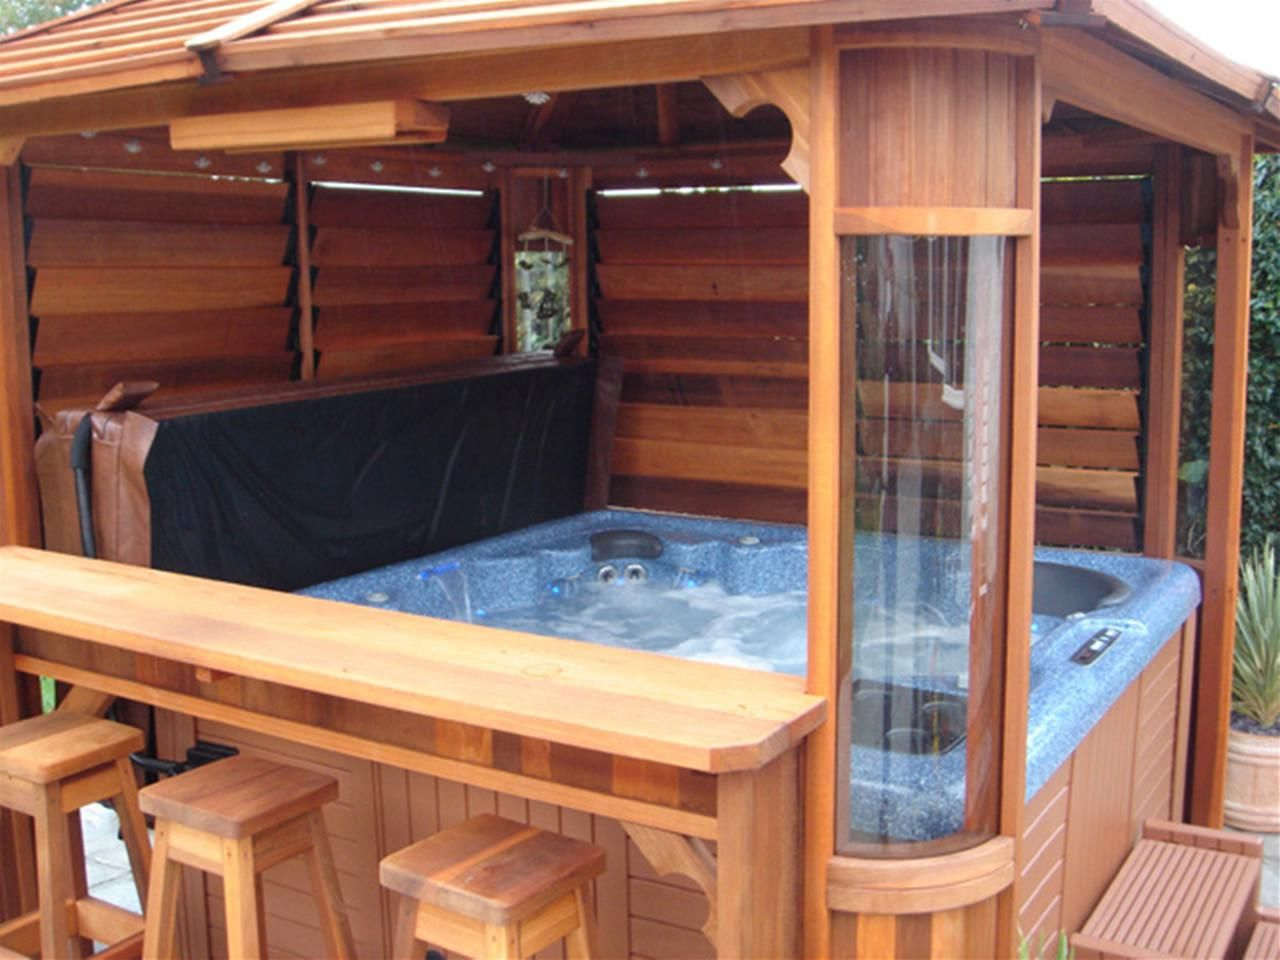 hot tub bar table - Google Search | HOME EXTERIOR ...